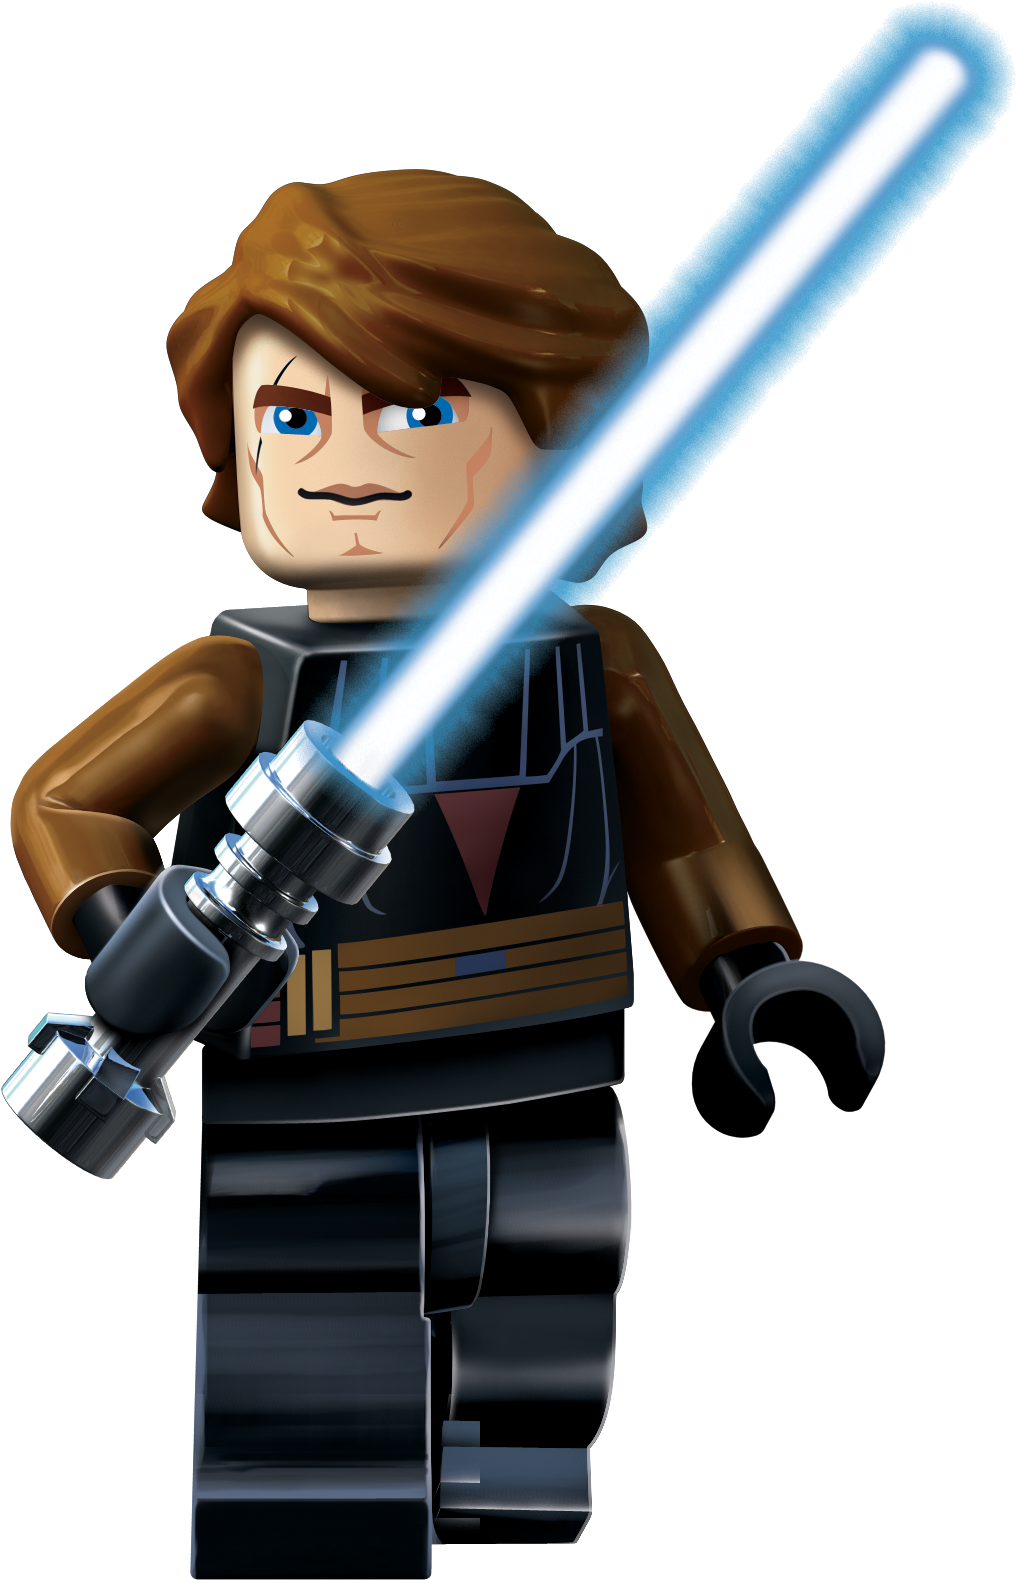 Anakin Skywalker Lego Star Wars Wiki Fandom Powered.